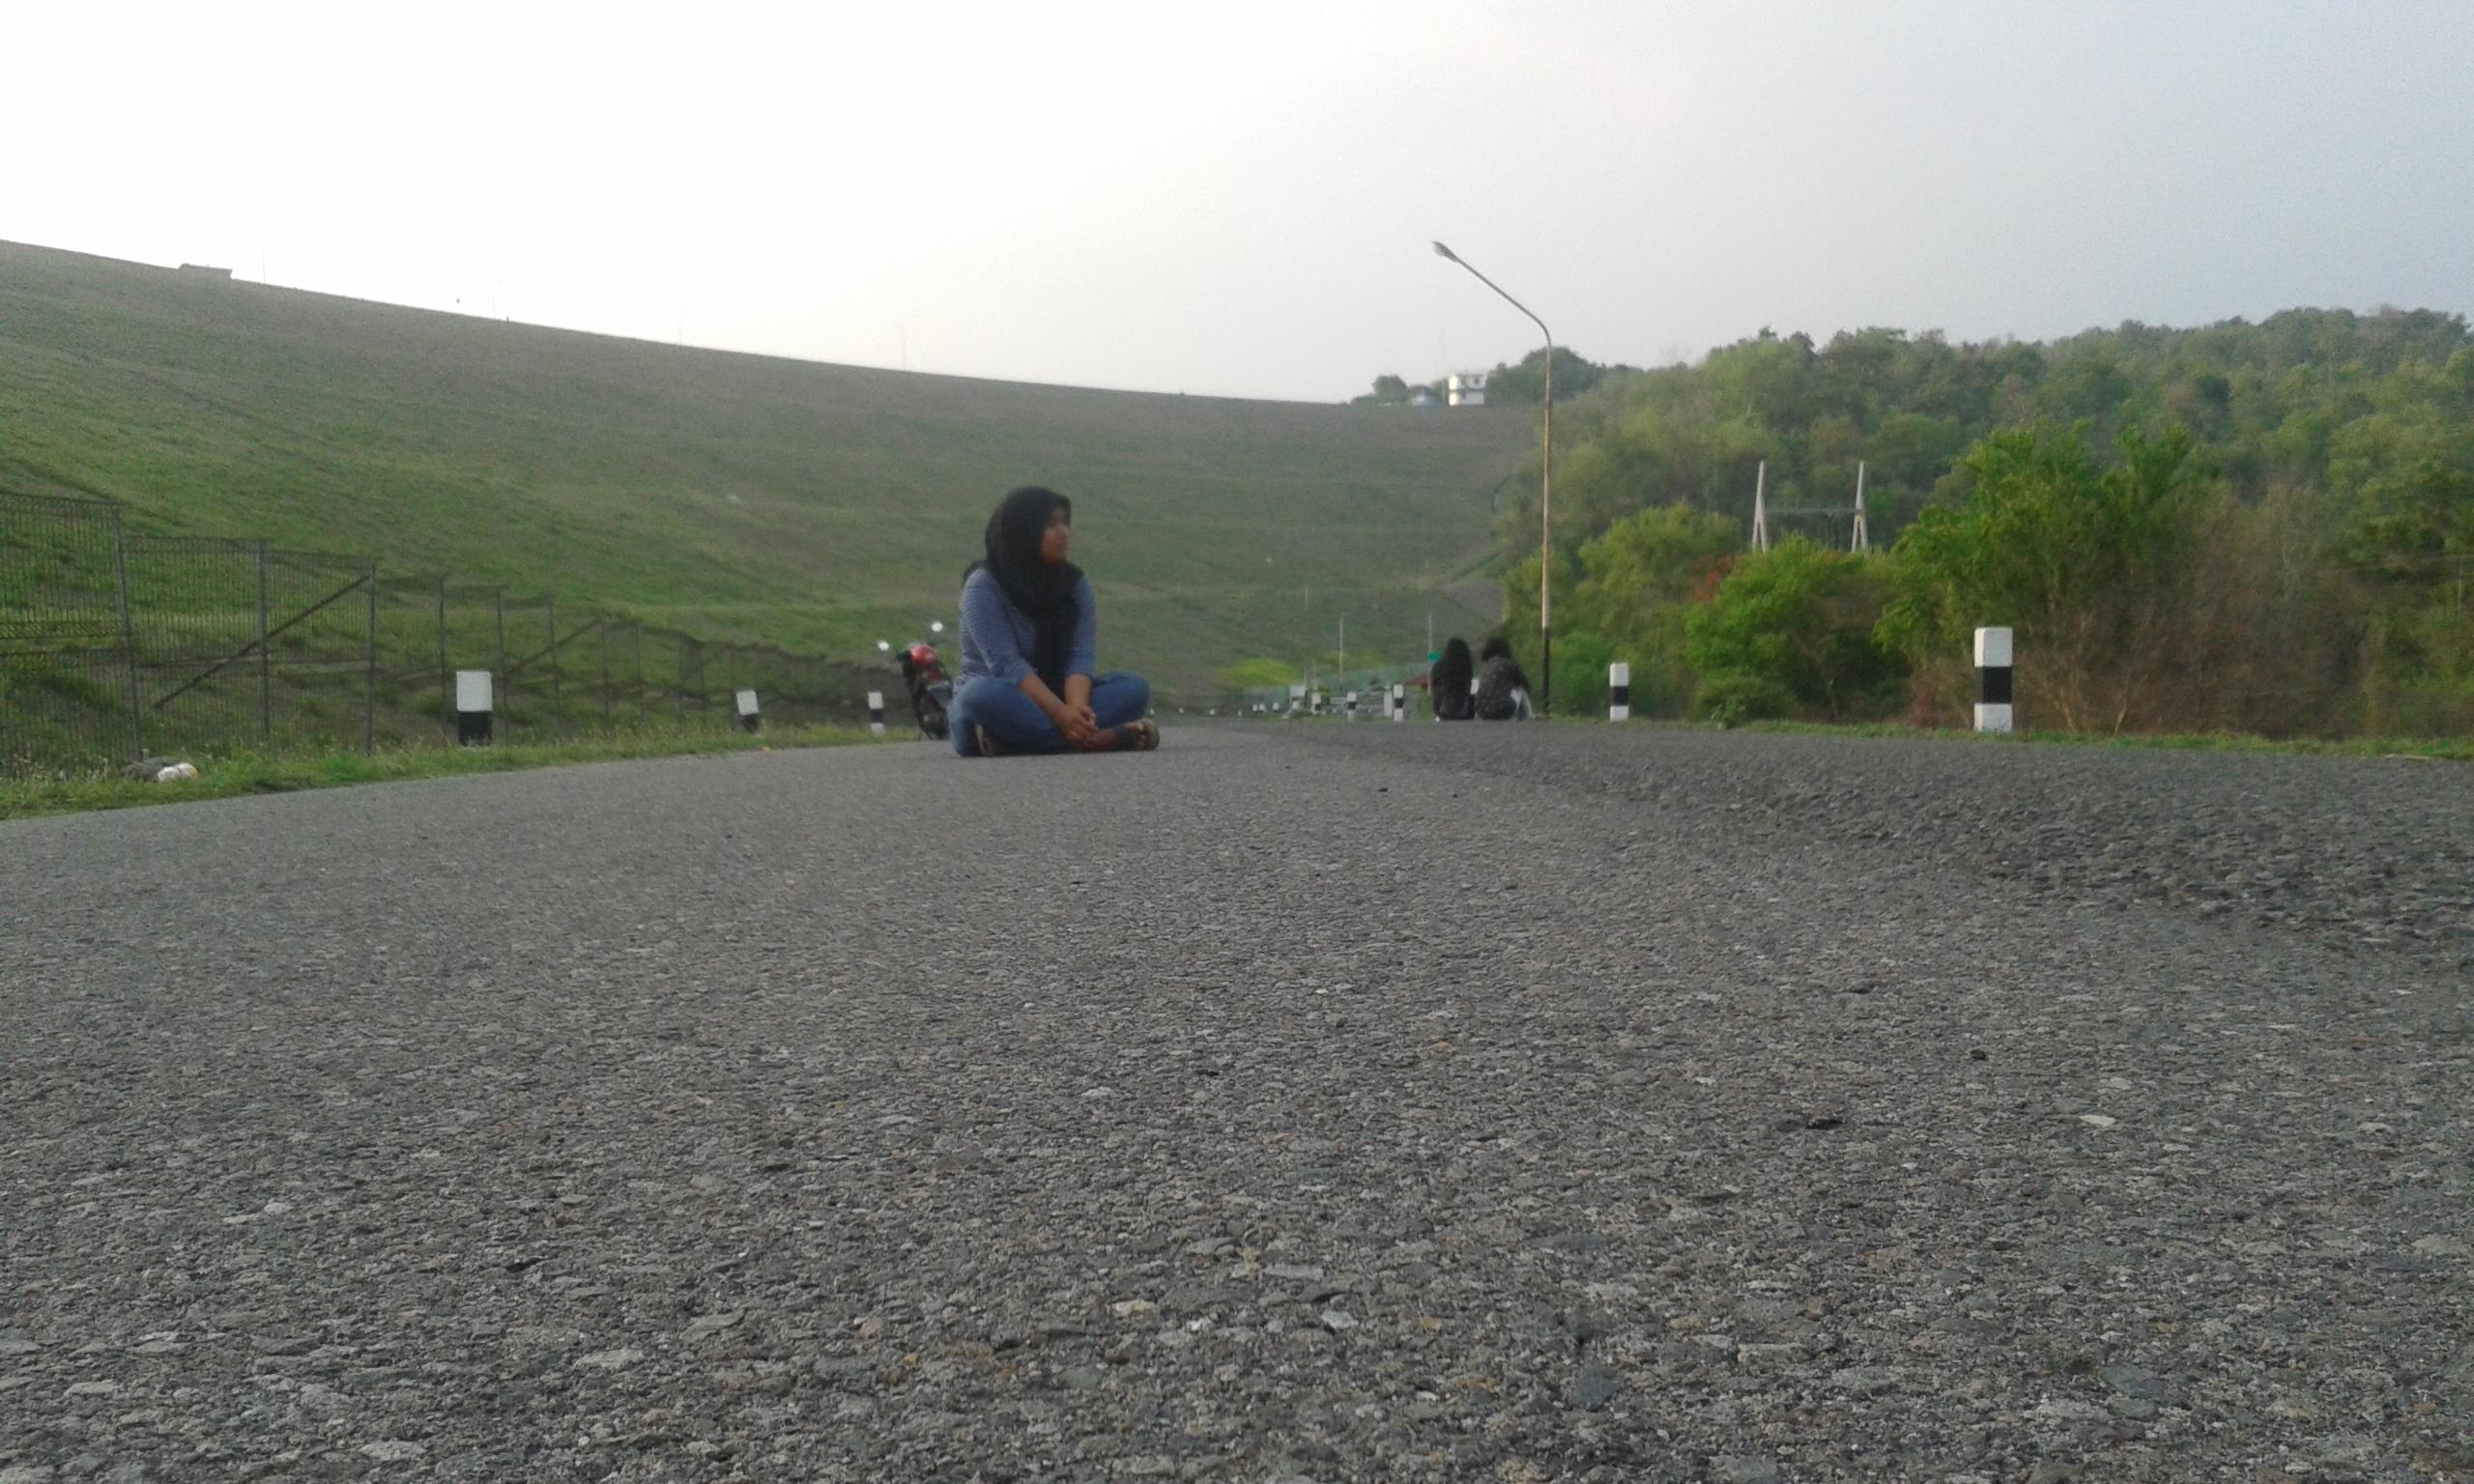 Wisata Sragen Kholifatulfauziah Makam Joko Tingkir Kab